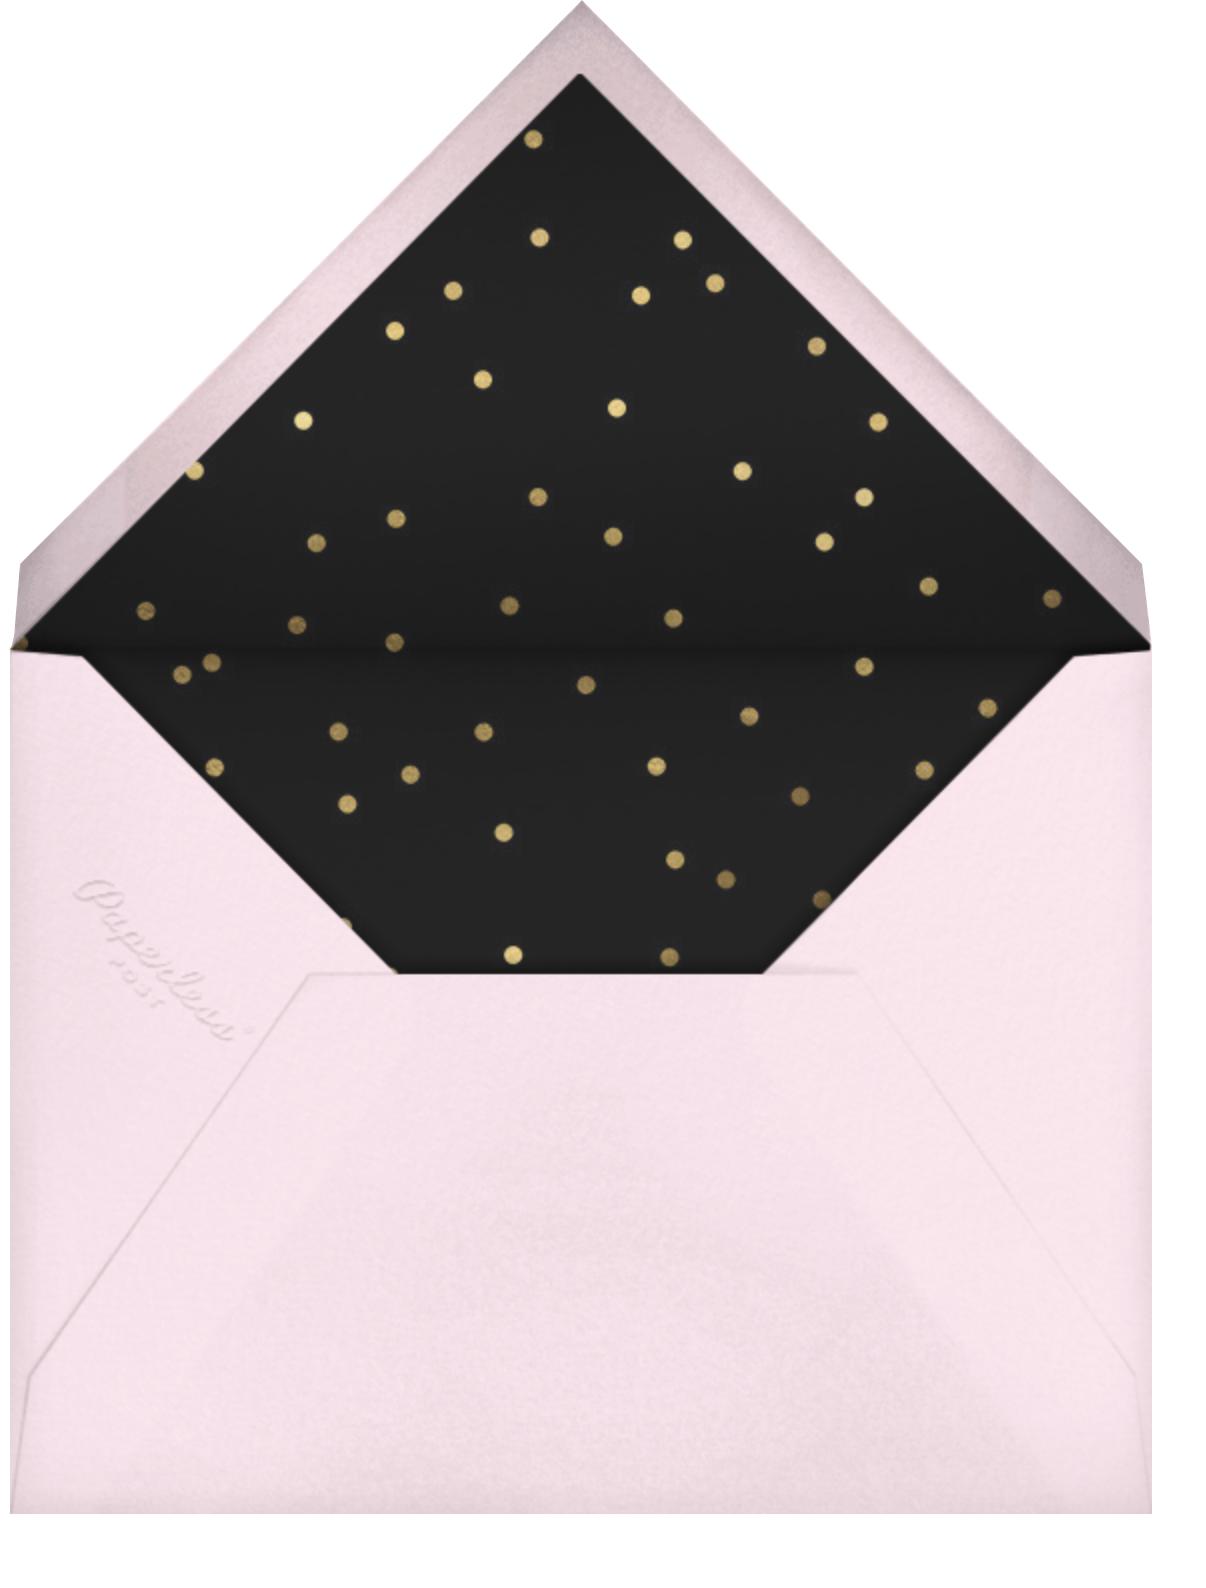 That Petals It - Black - kate spade new york - Adult birthday - envelope back